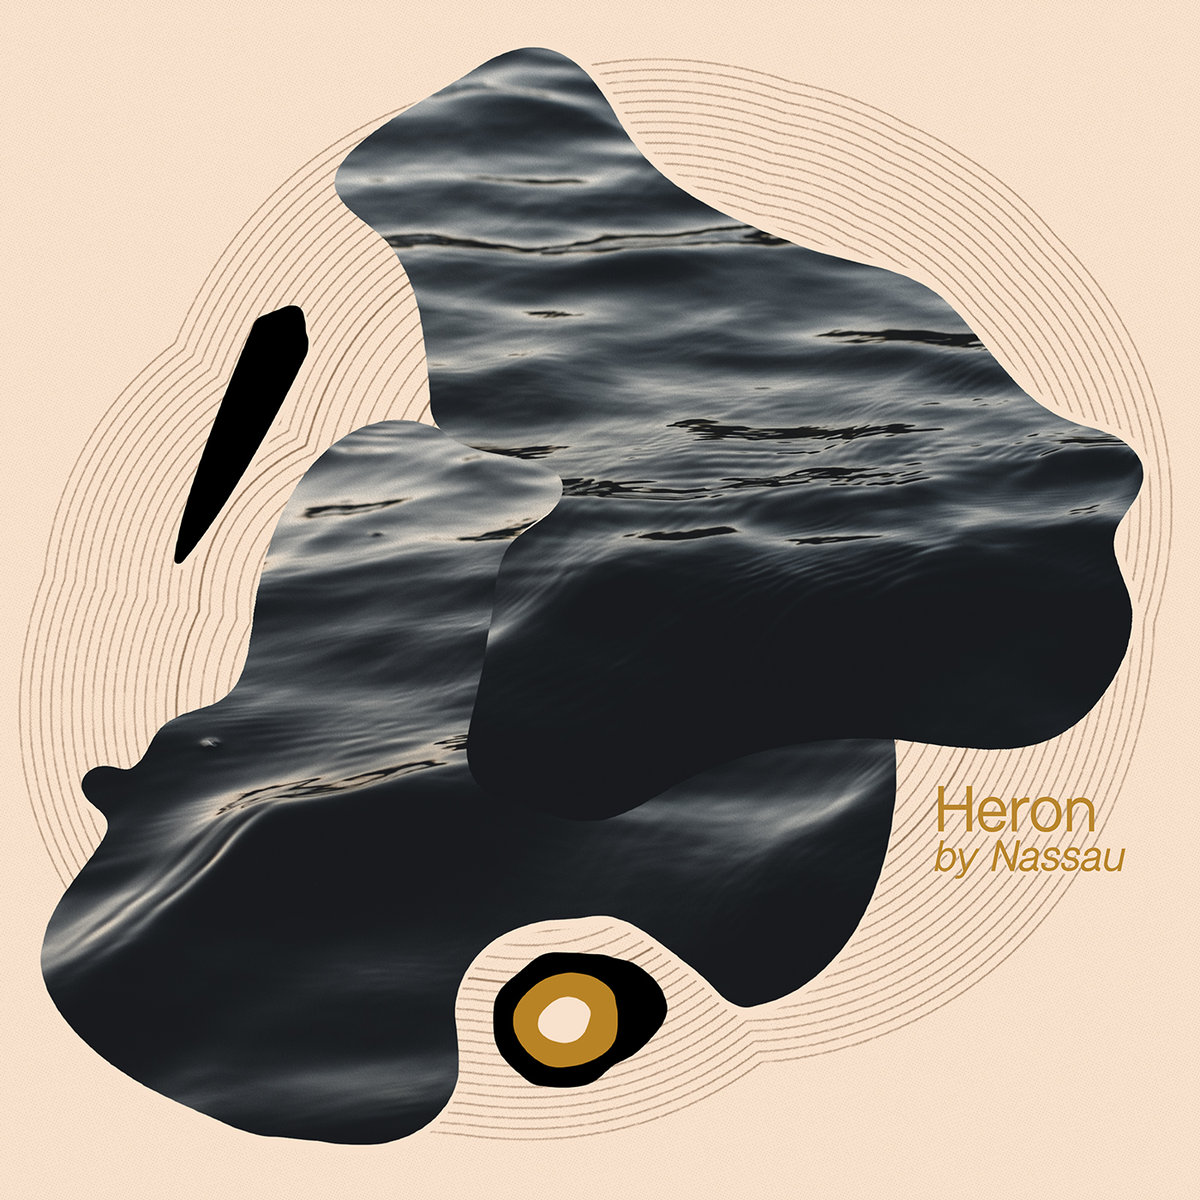 nassau heron album art